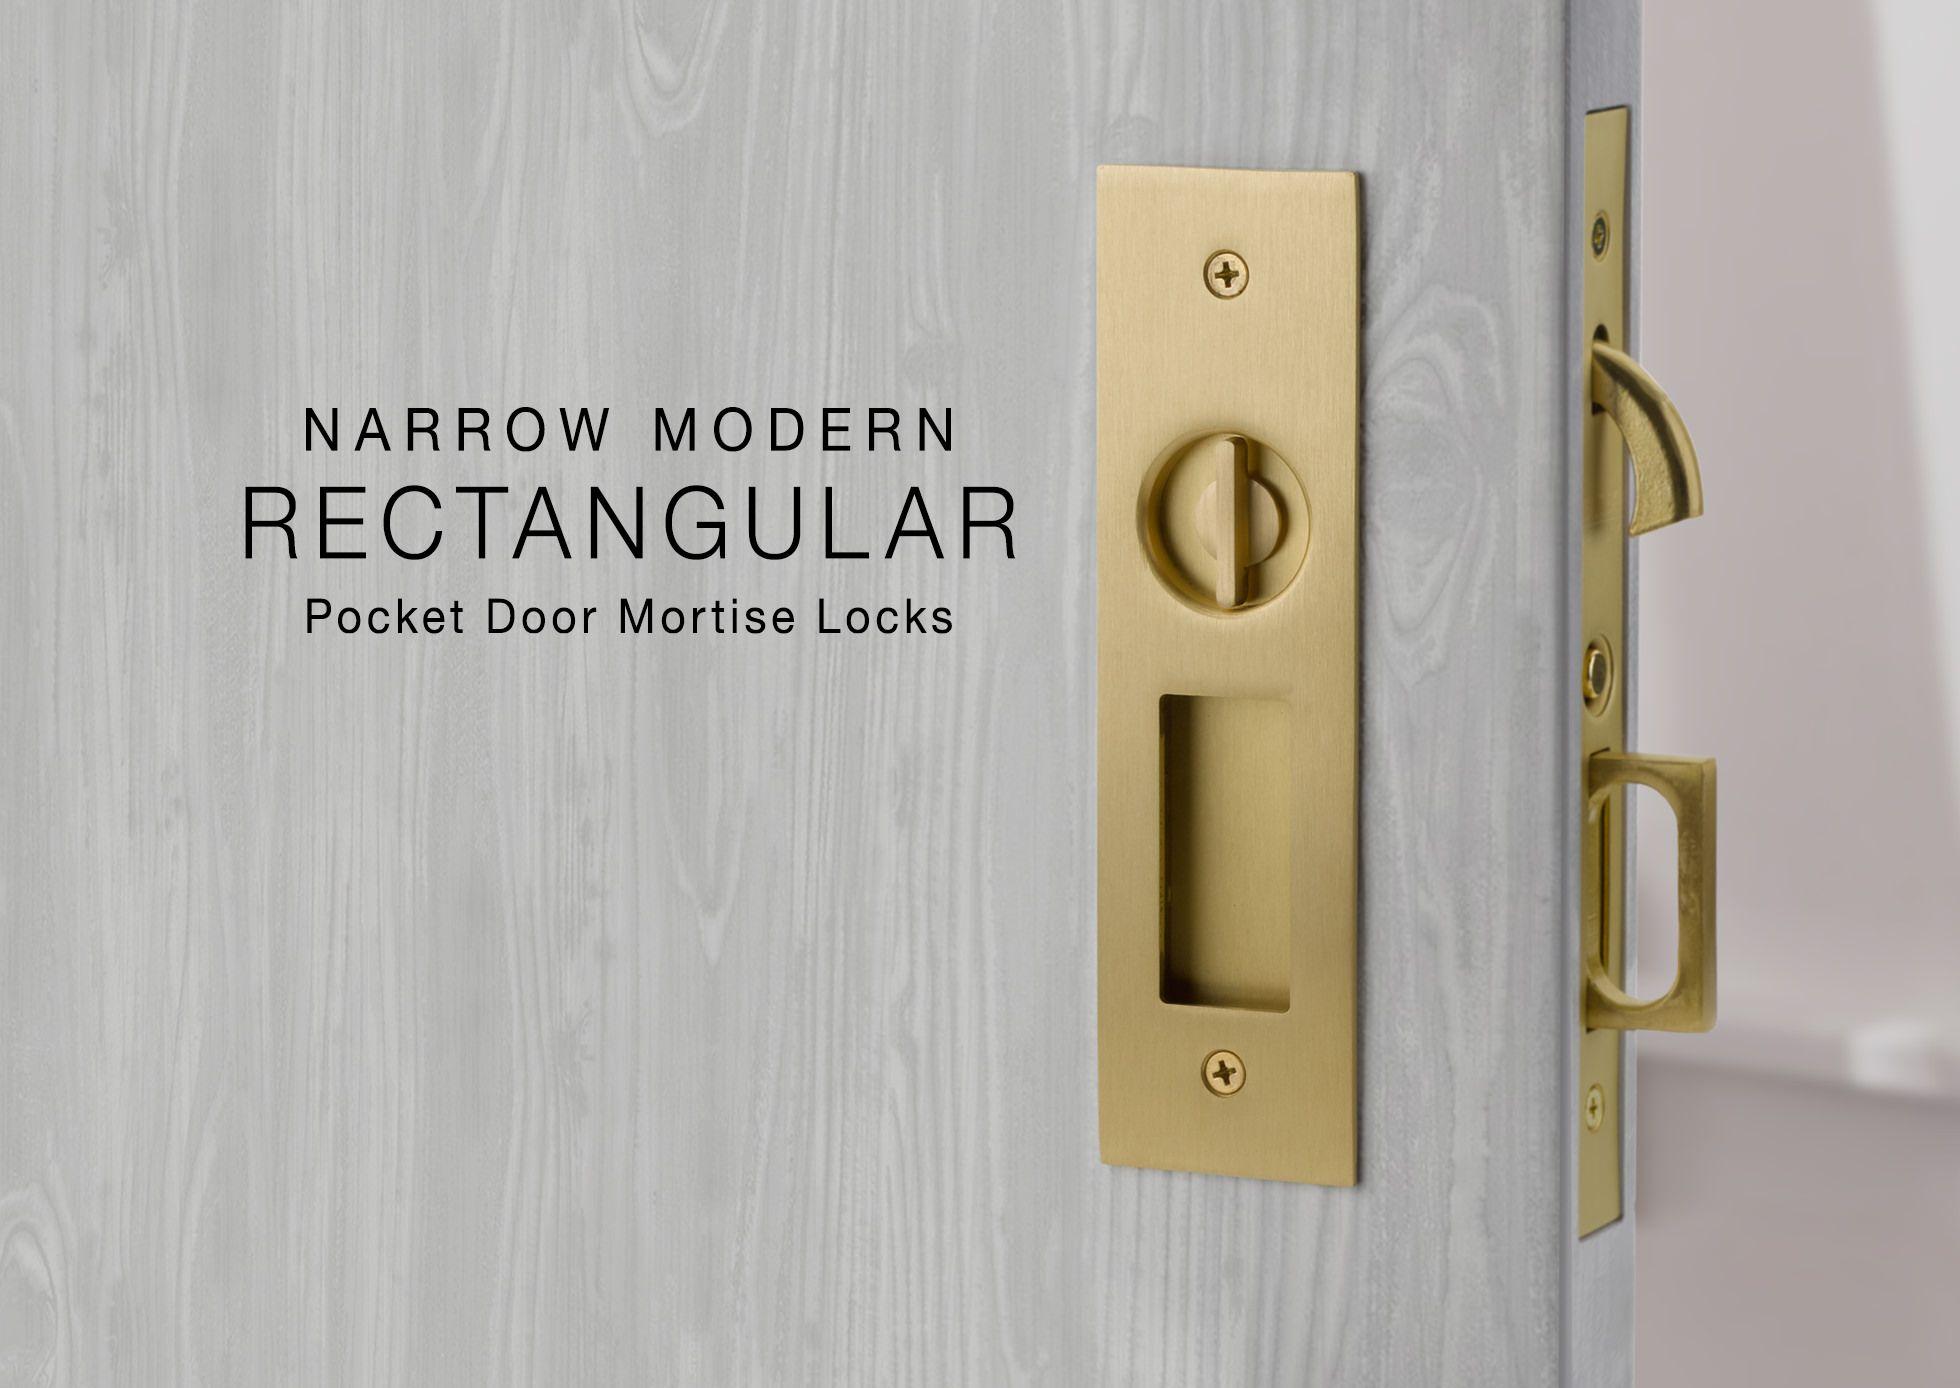 Narrow Pocket Door Mortise Locks Emtek Products Inc Pocket